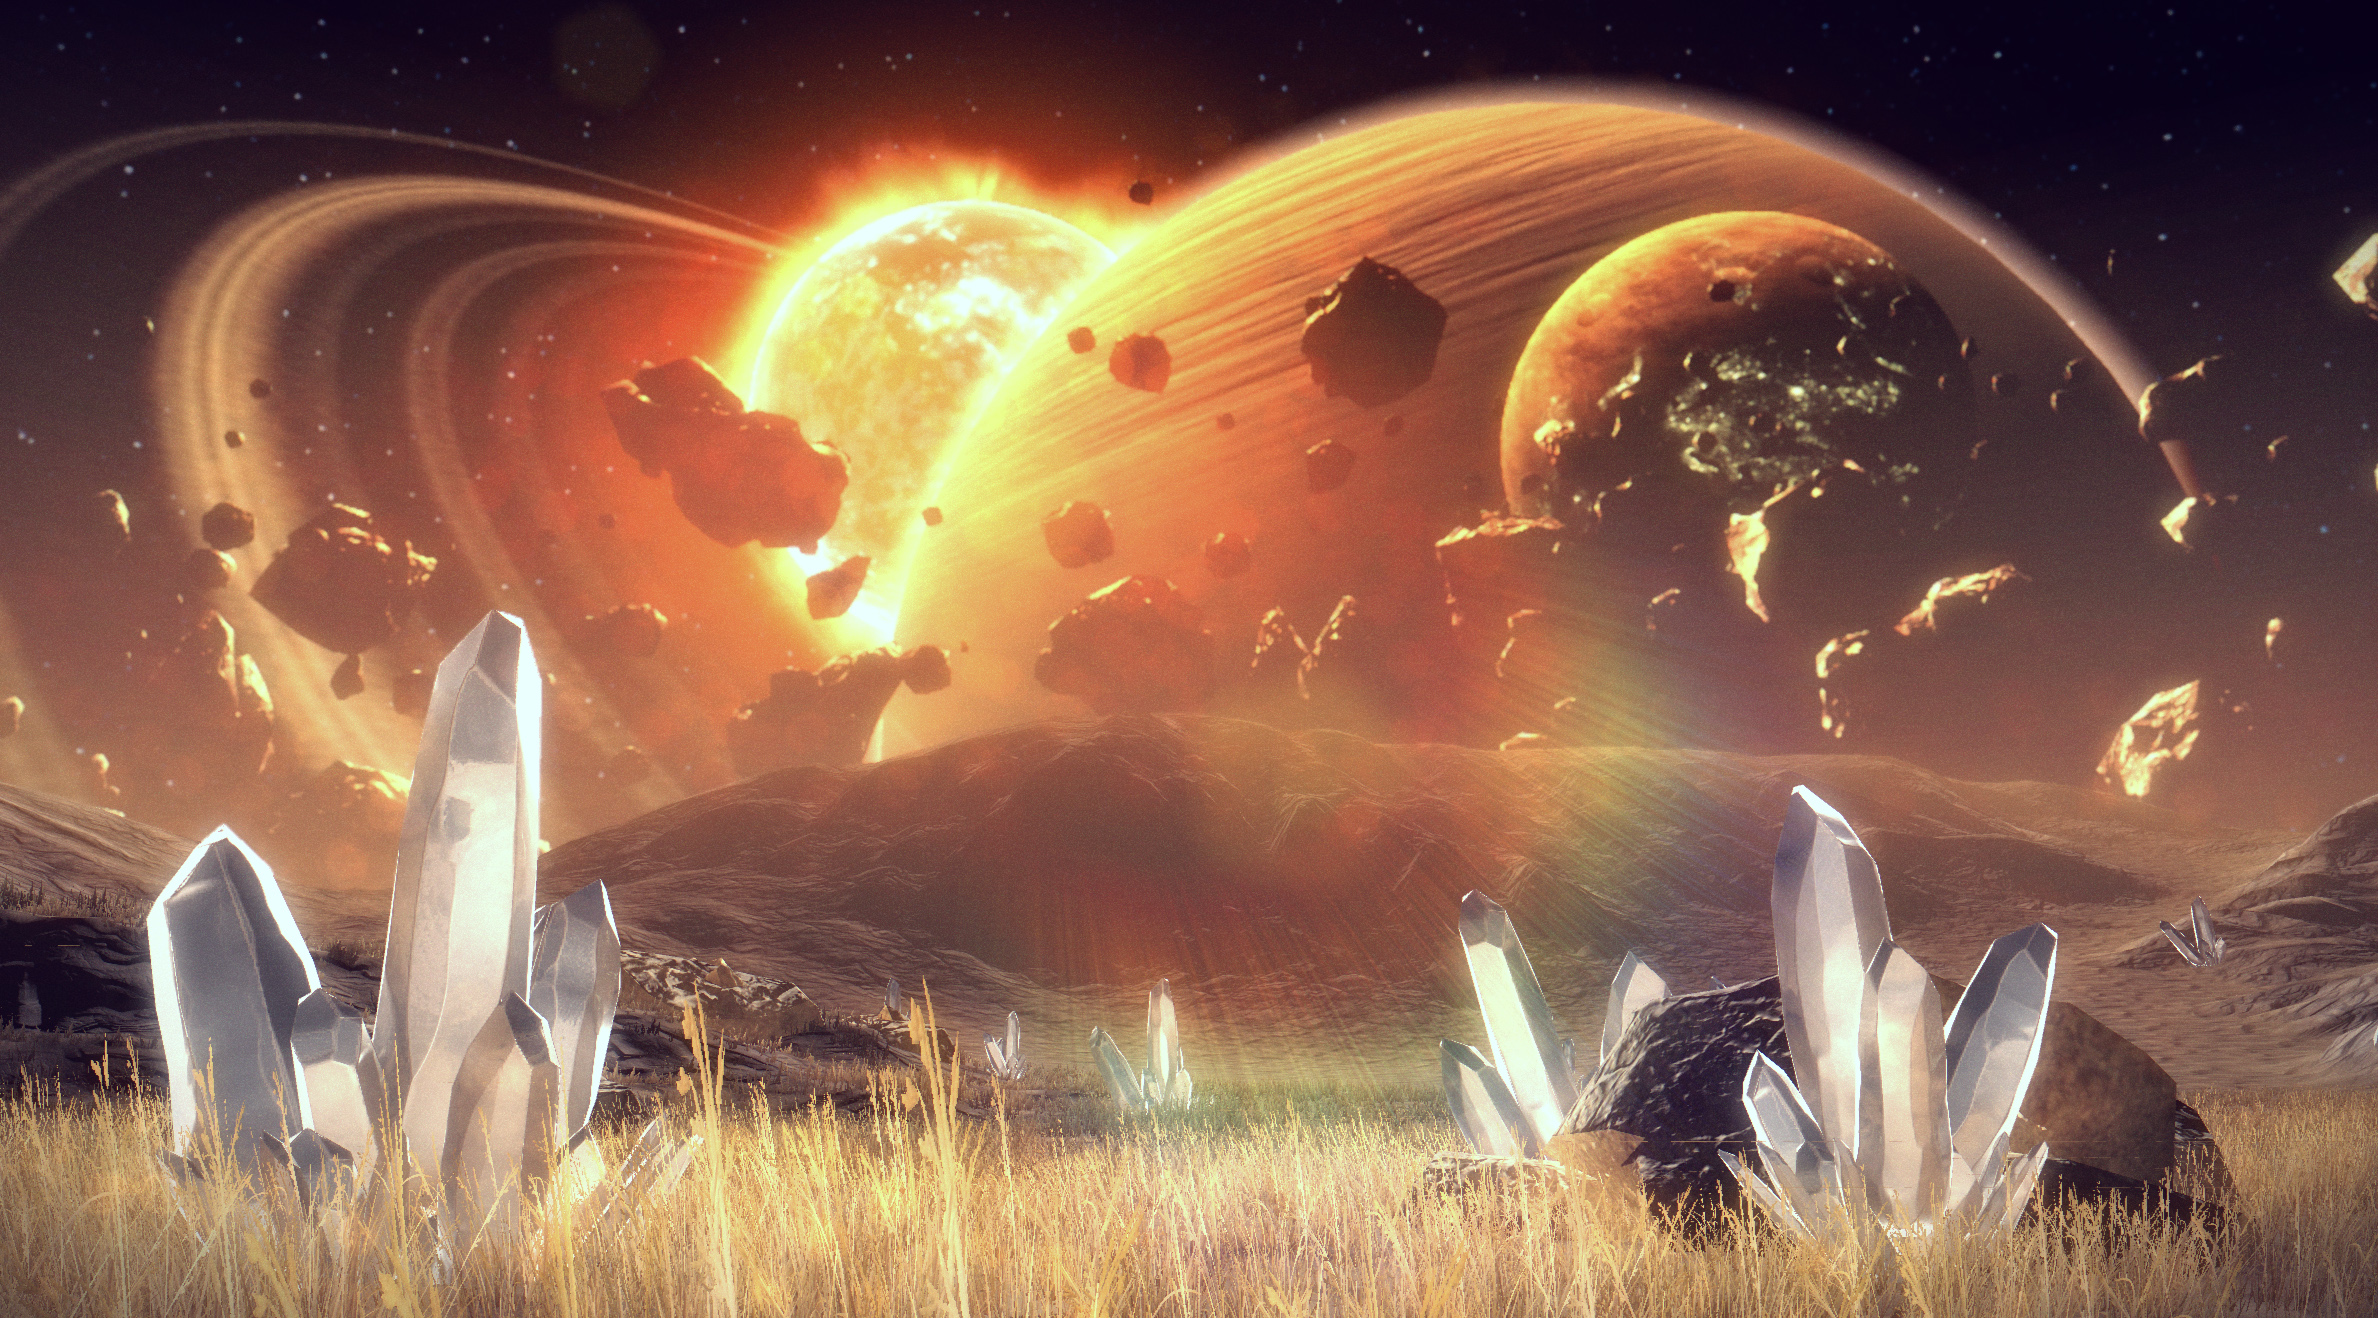 Alien world environment